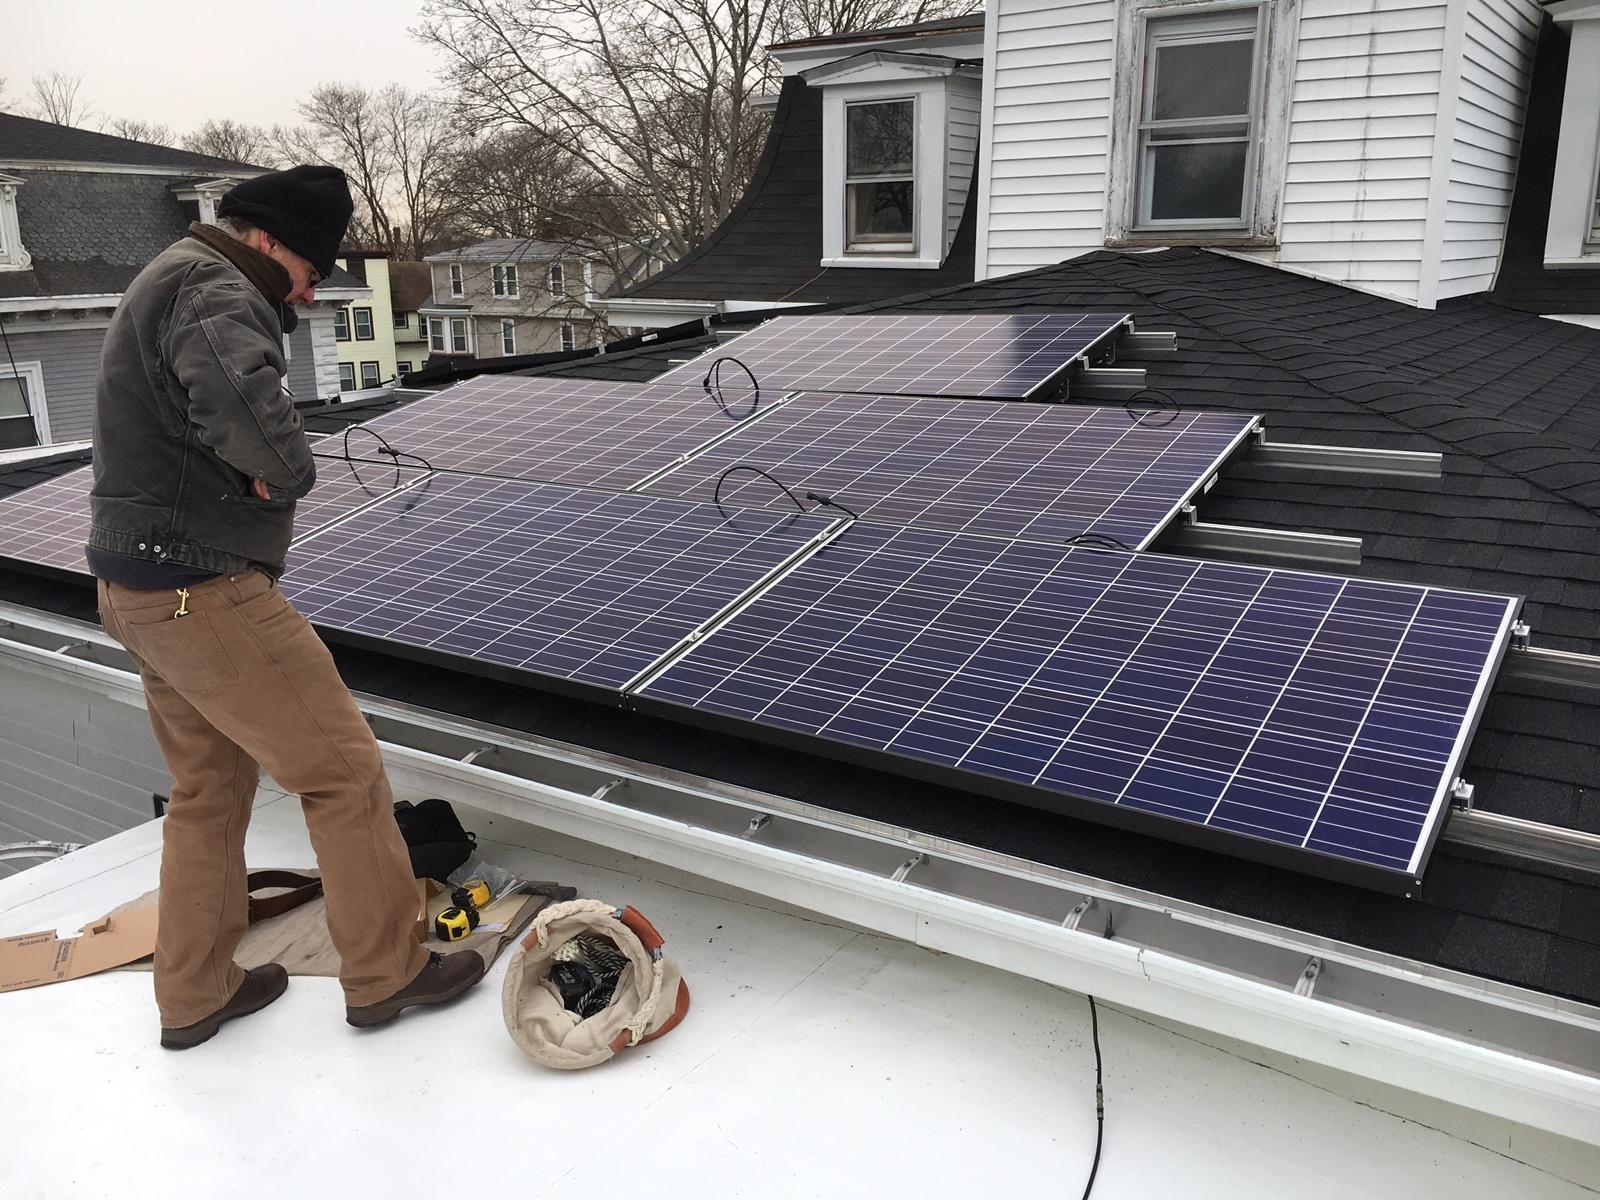 Worthmore solar array, Beverly MA; January 2017